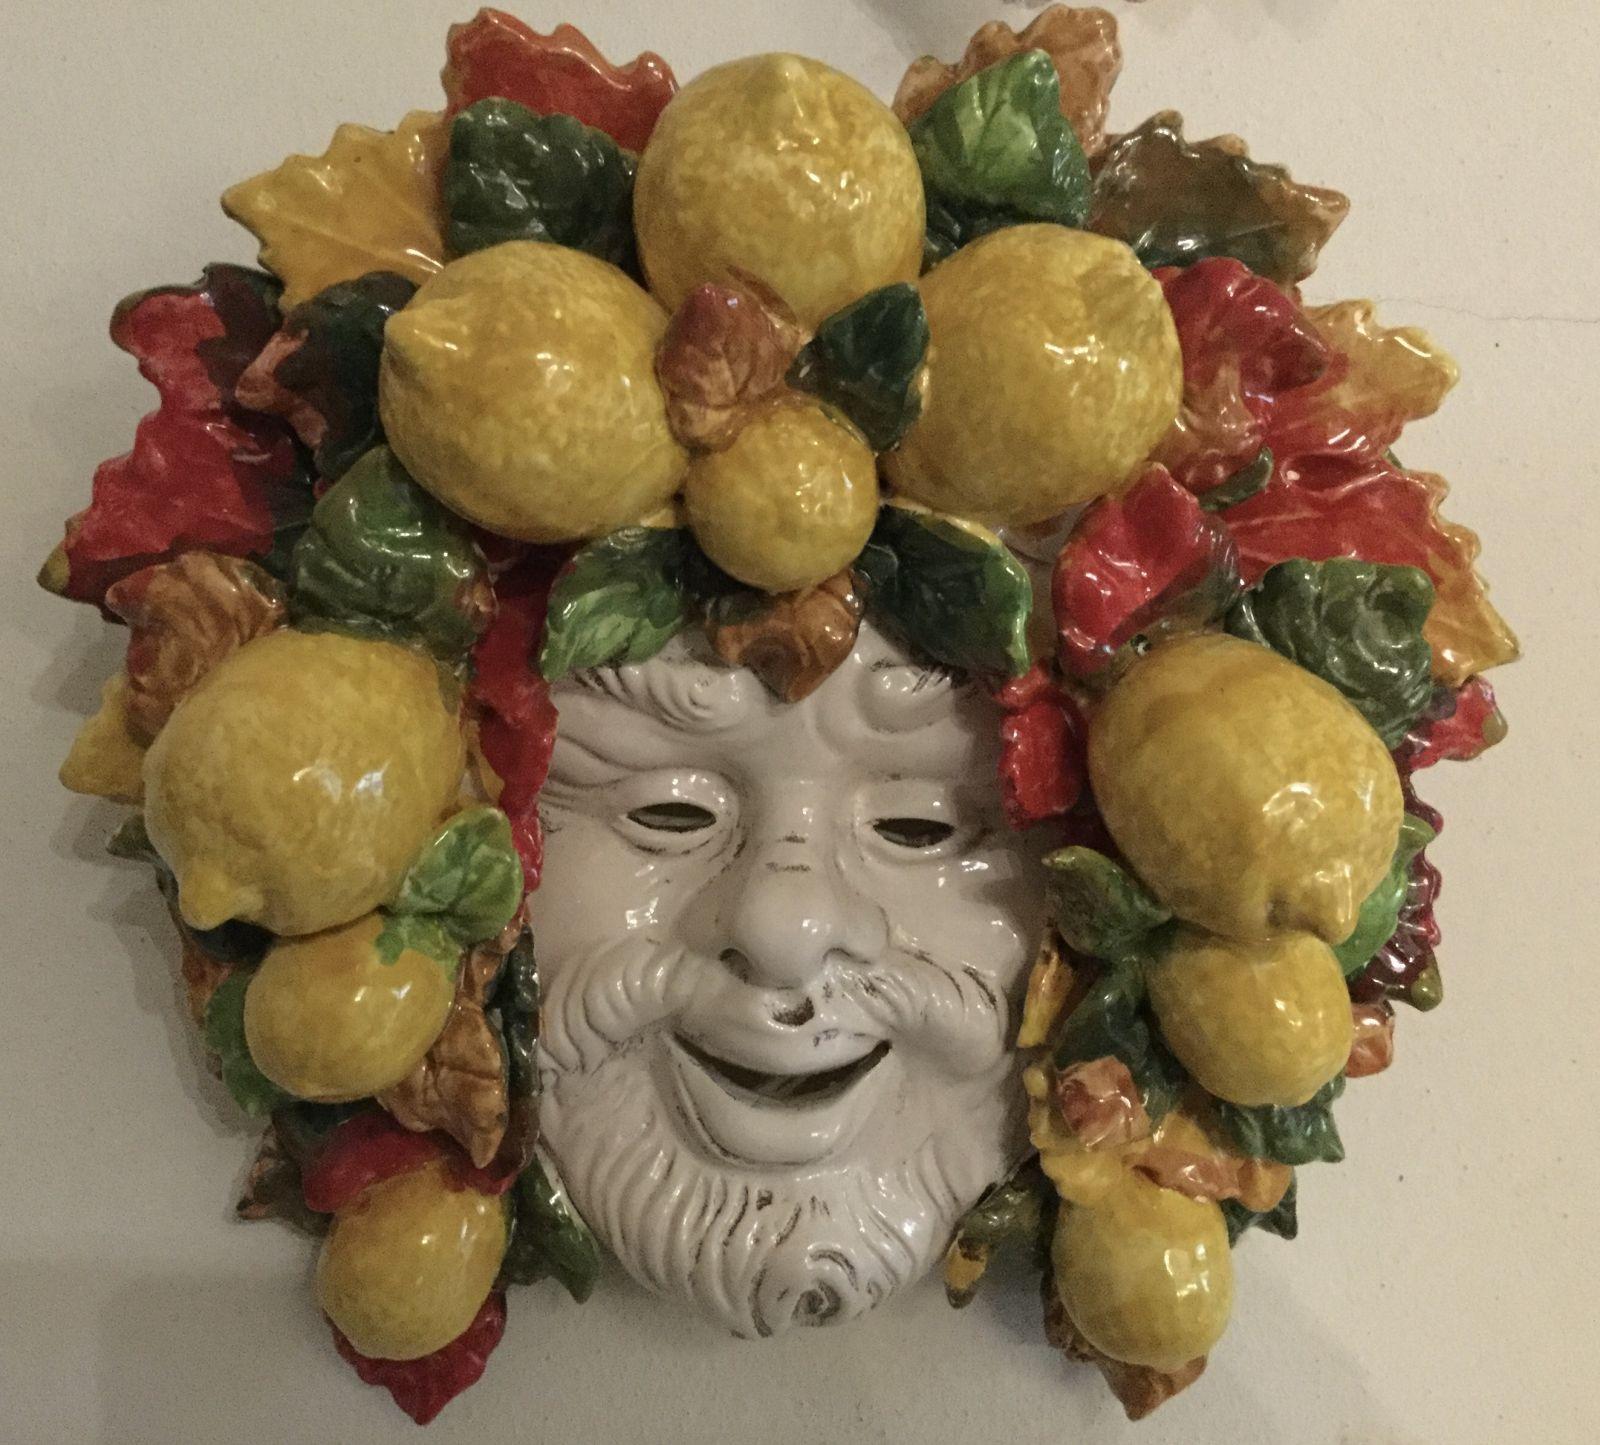 Maschera con limoni (4) 30x30